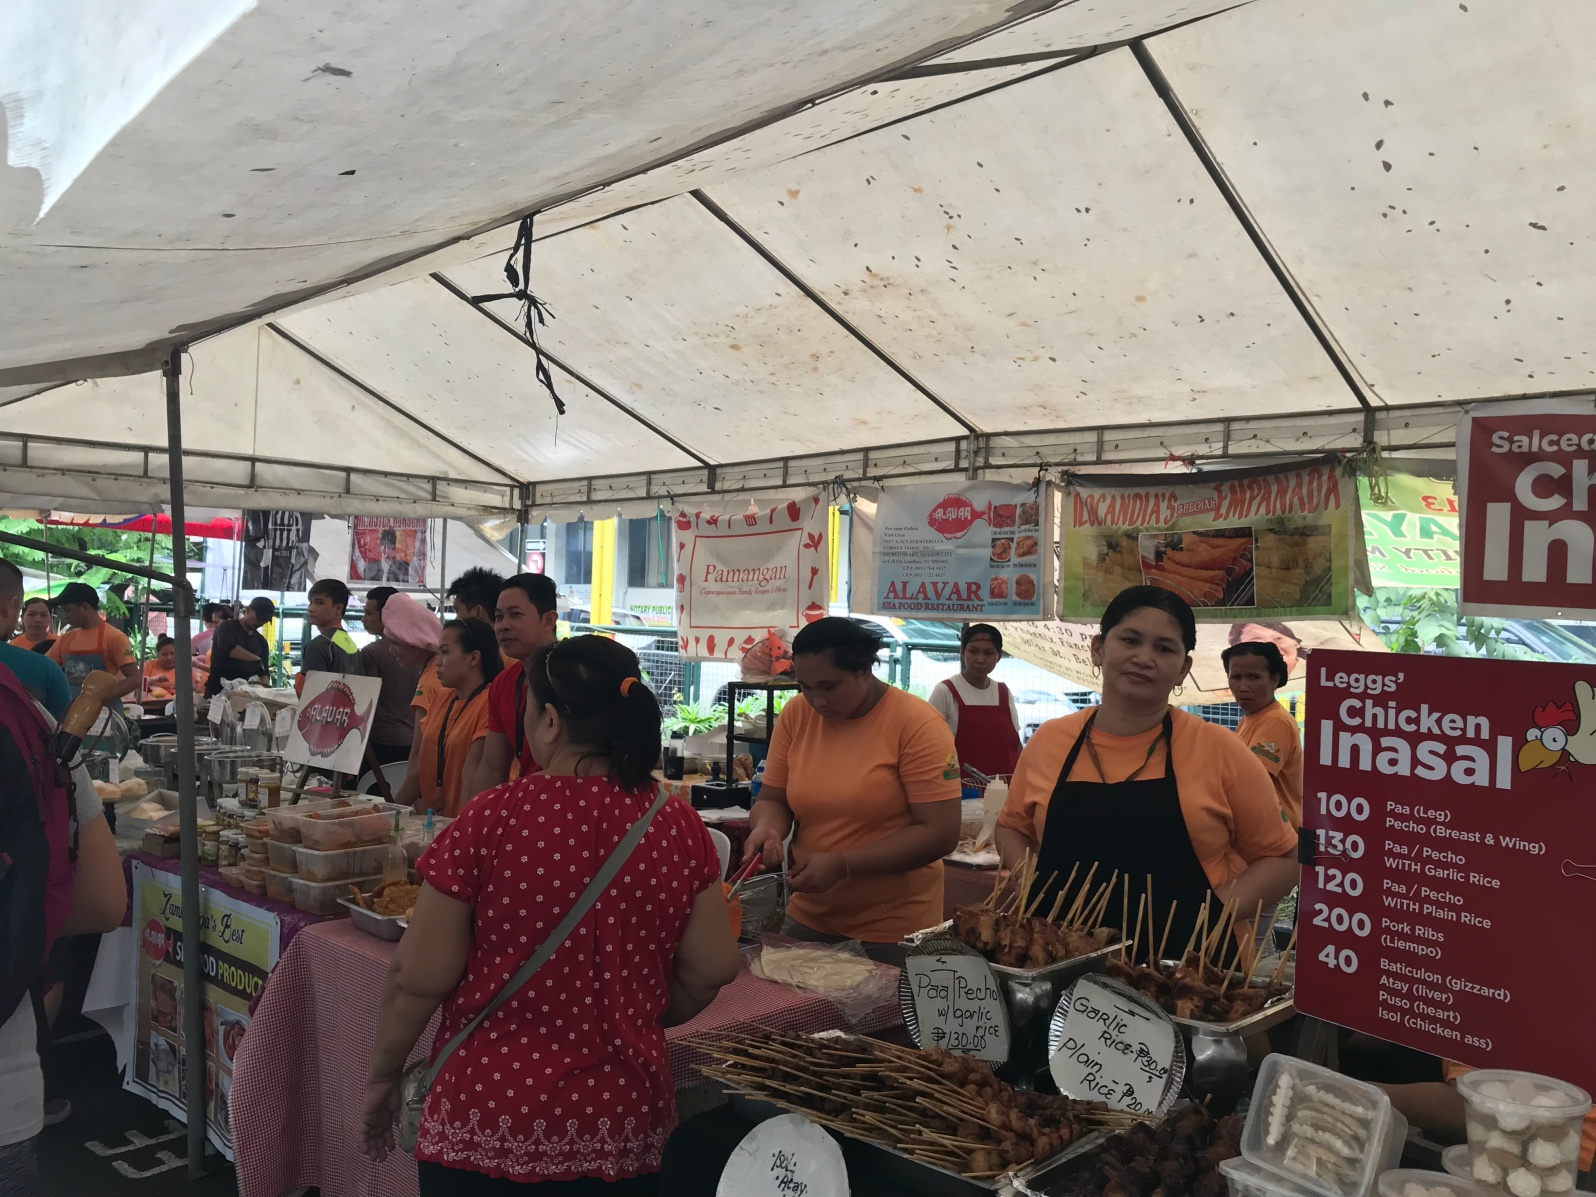 Philippines, Manila, Pierce, Meghan, Weekend Market Vendors